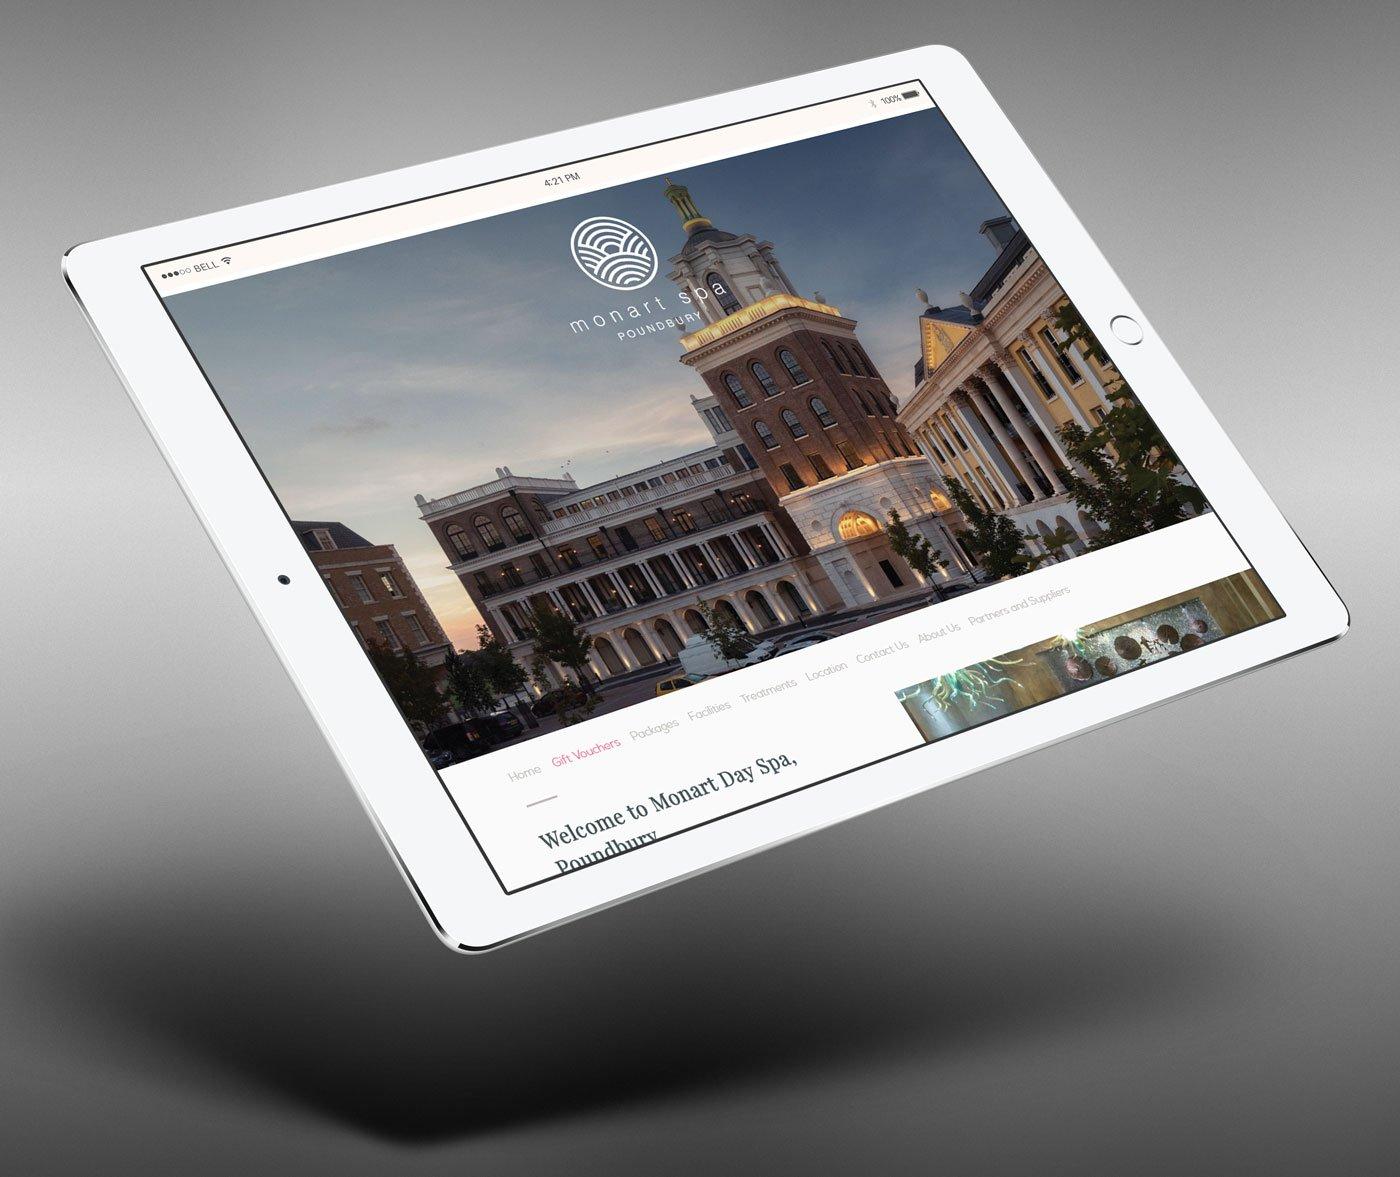 monart poundbury website mobile ready homepage by pixelpod